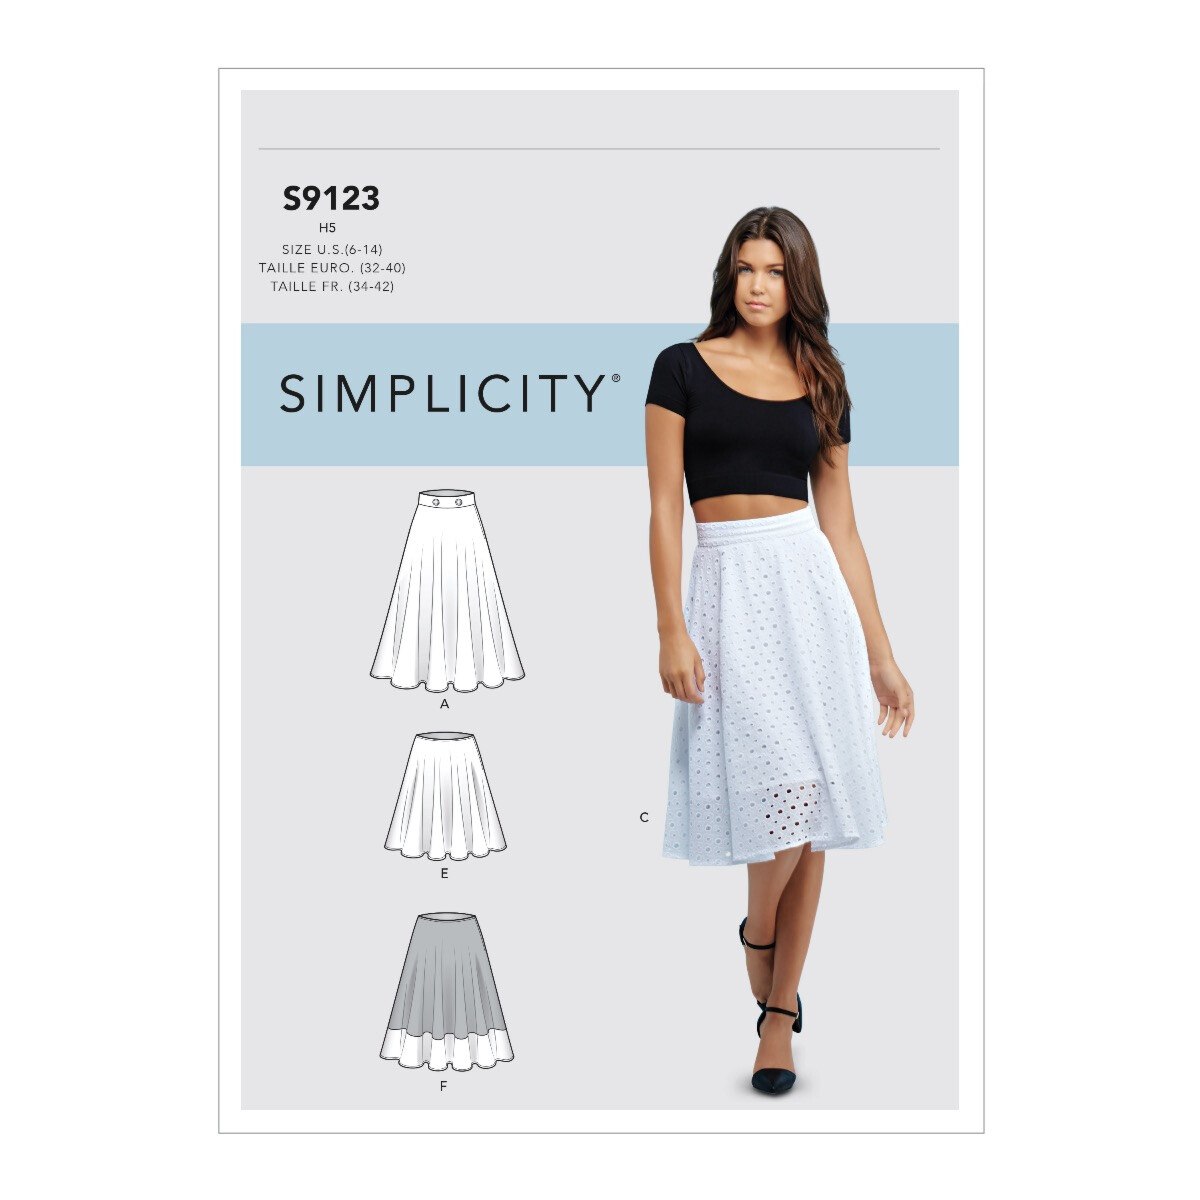 Simplicity - 9123